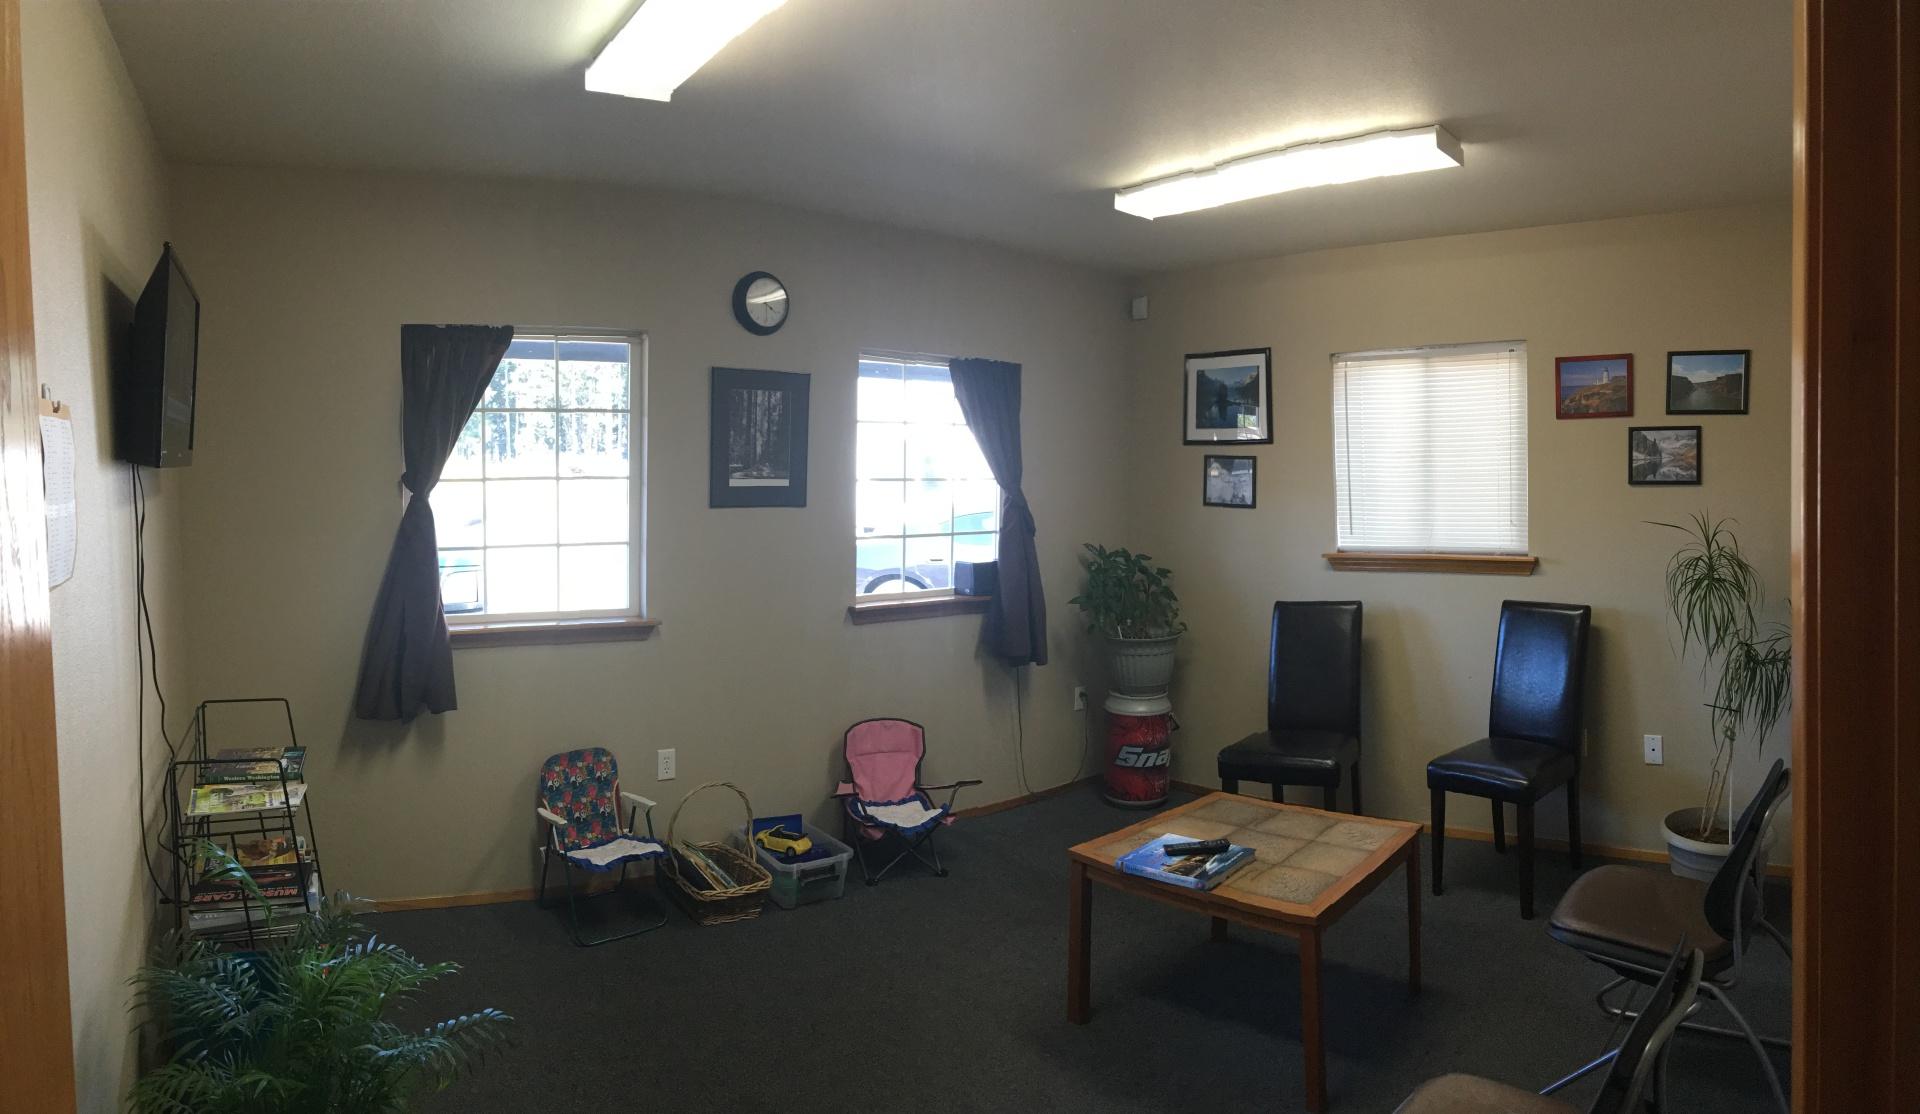 Comfortable waiting room